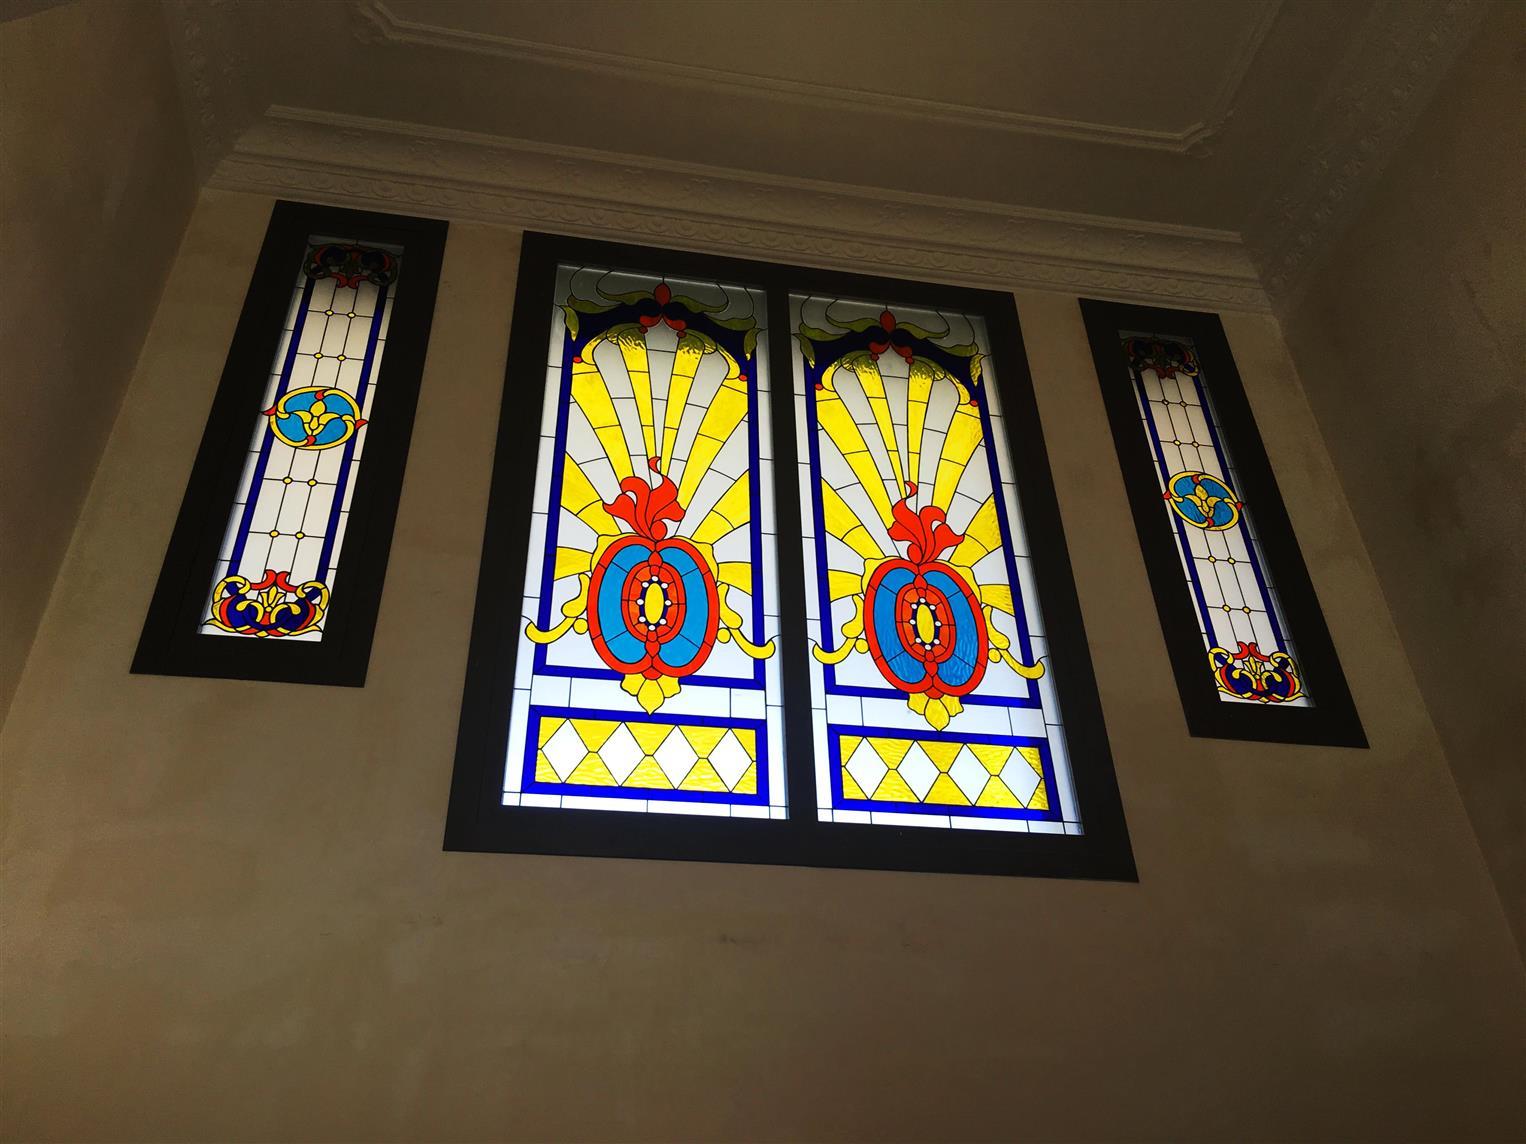 hamam-banyo-tavan-vitraylari20171221185417995.jpg izmir vitray çalışması